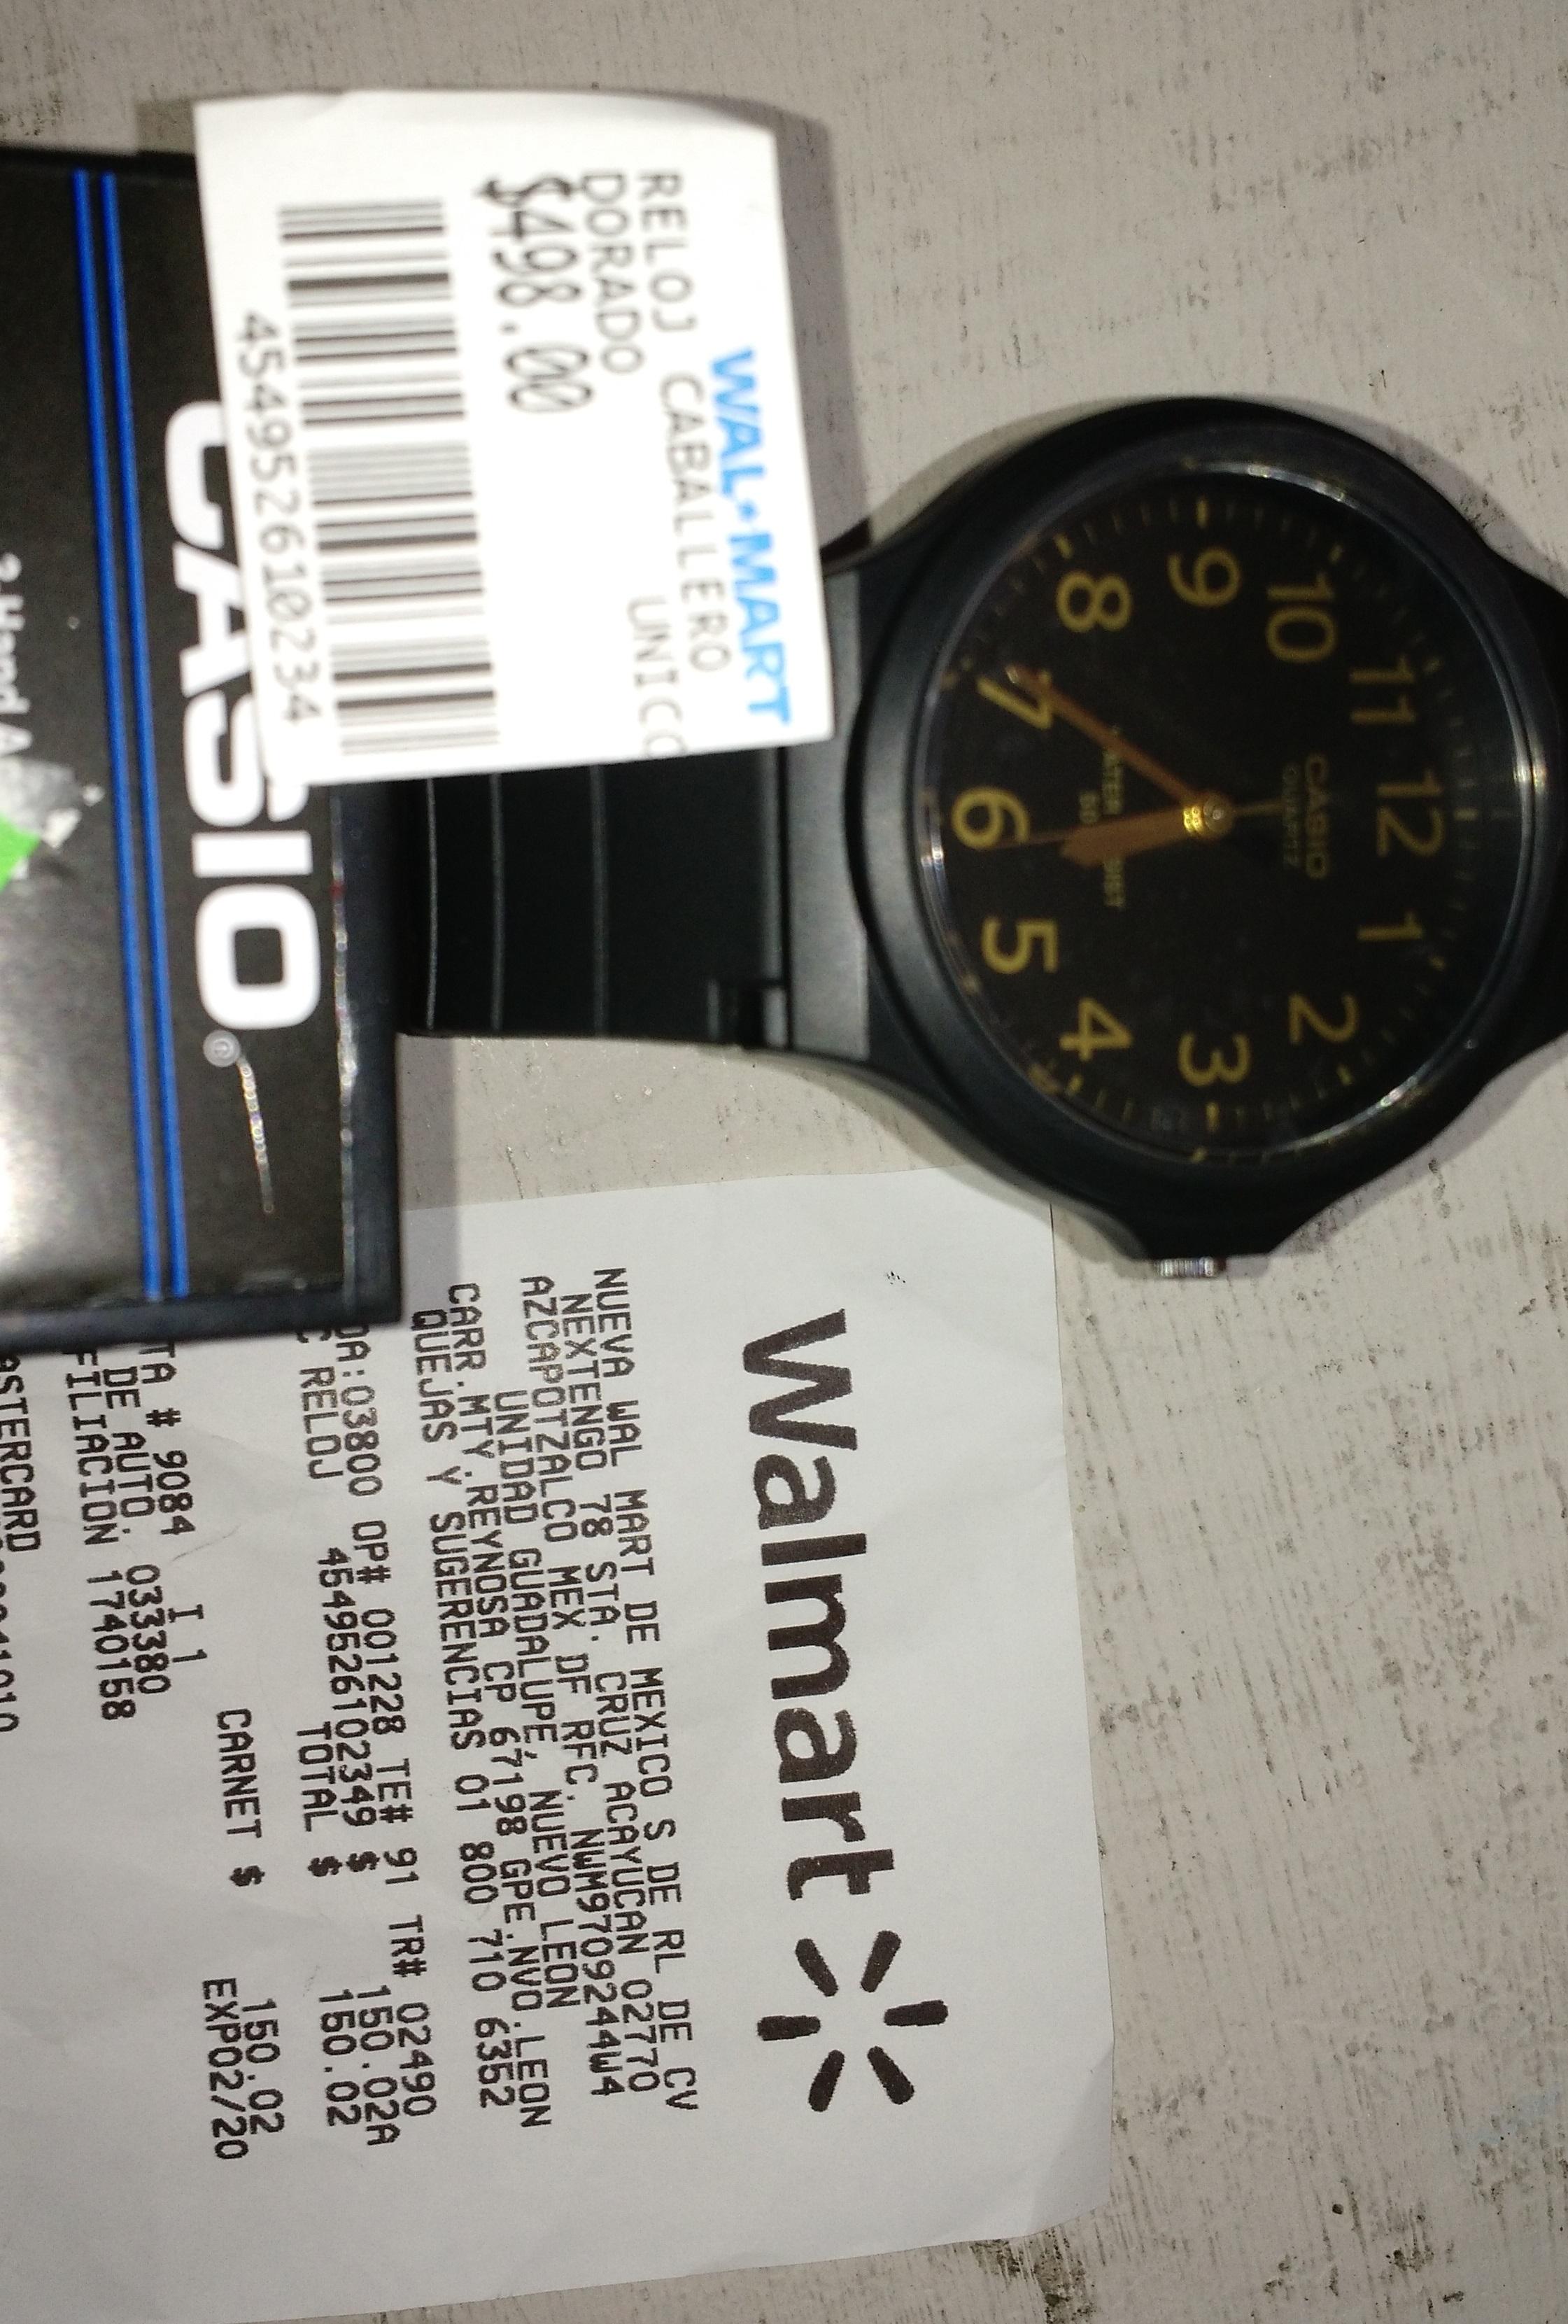 Walmart San sebastian Gpe,N.L. : Reloj Casio  $ 150.02